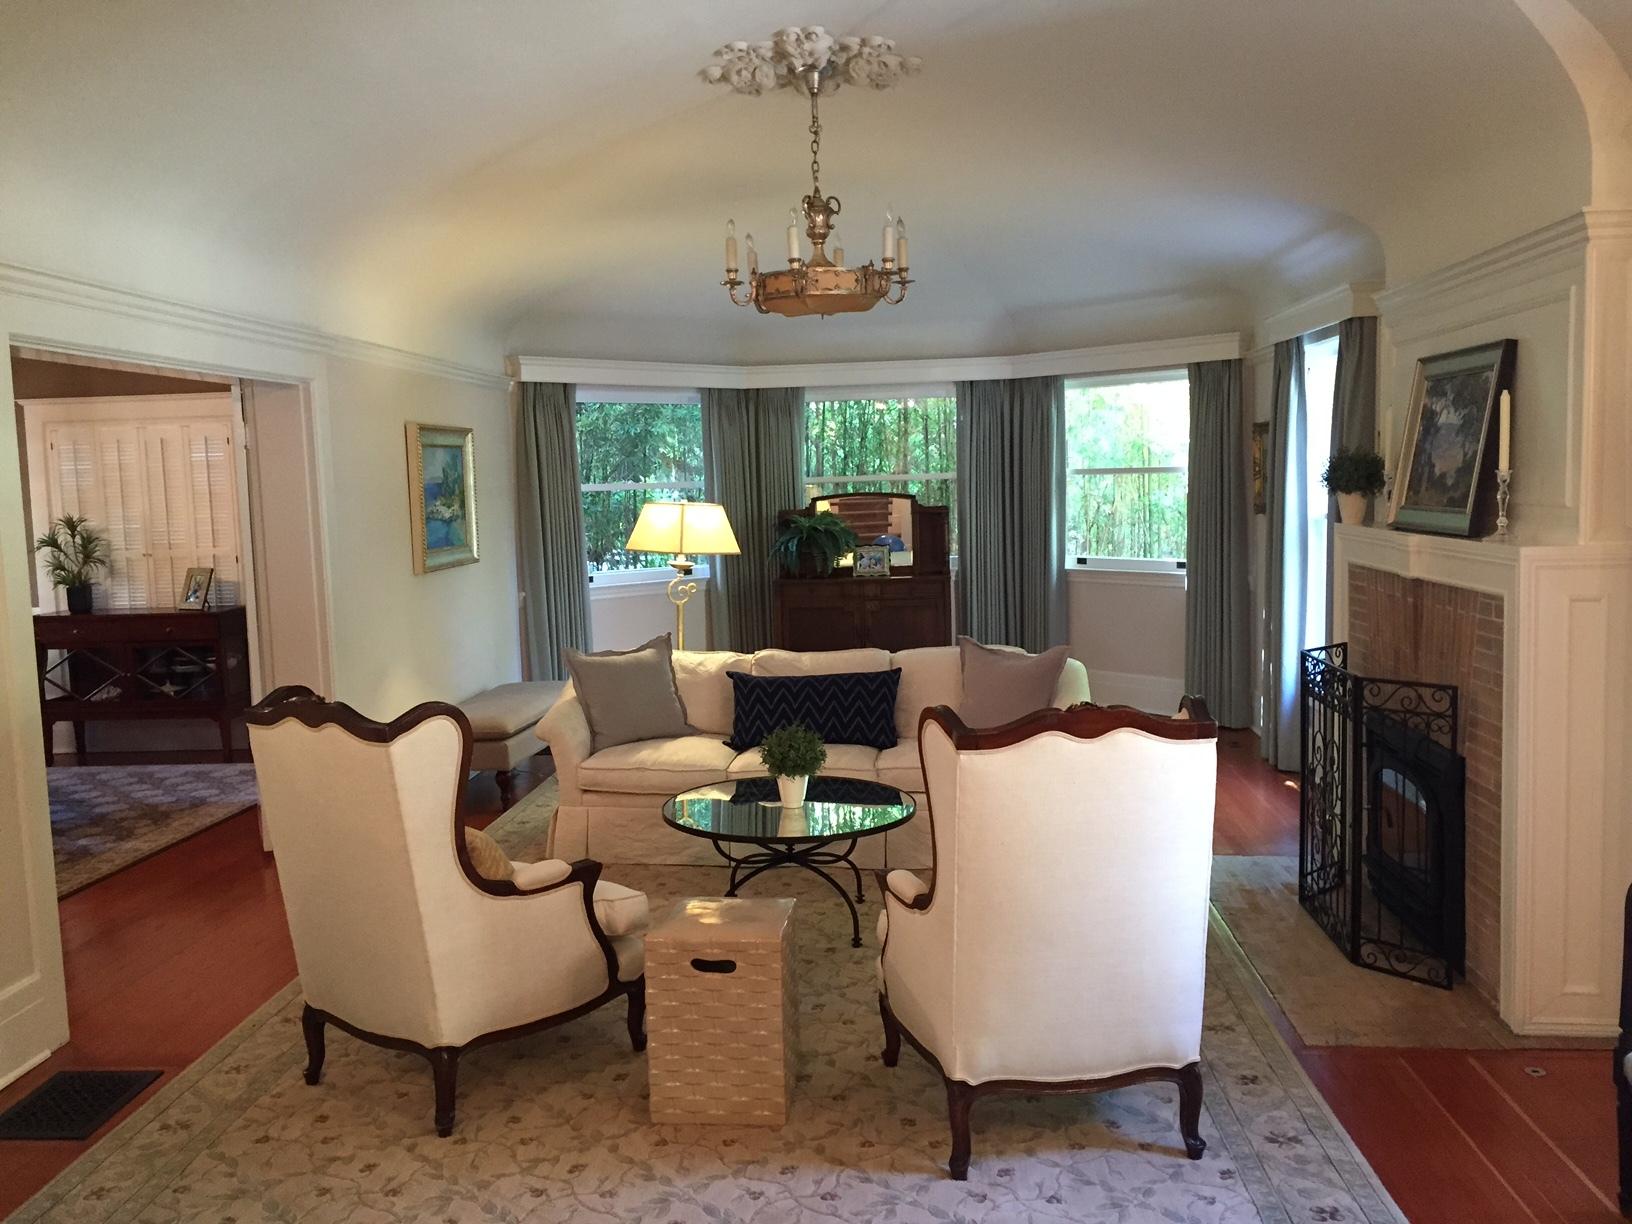 Carousel custom floors at 676 e green st pasadena ca on fave for Pasadena floors